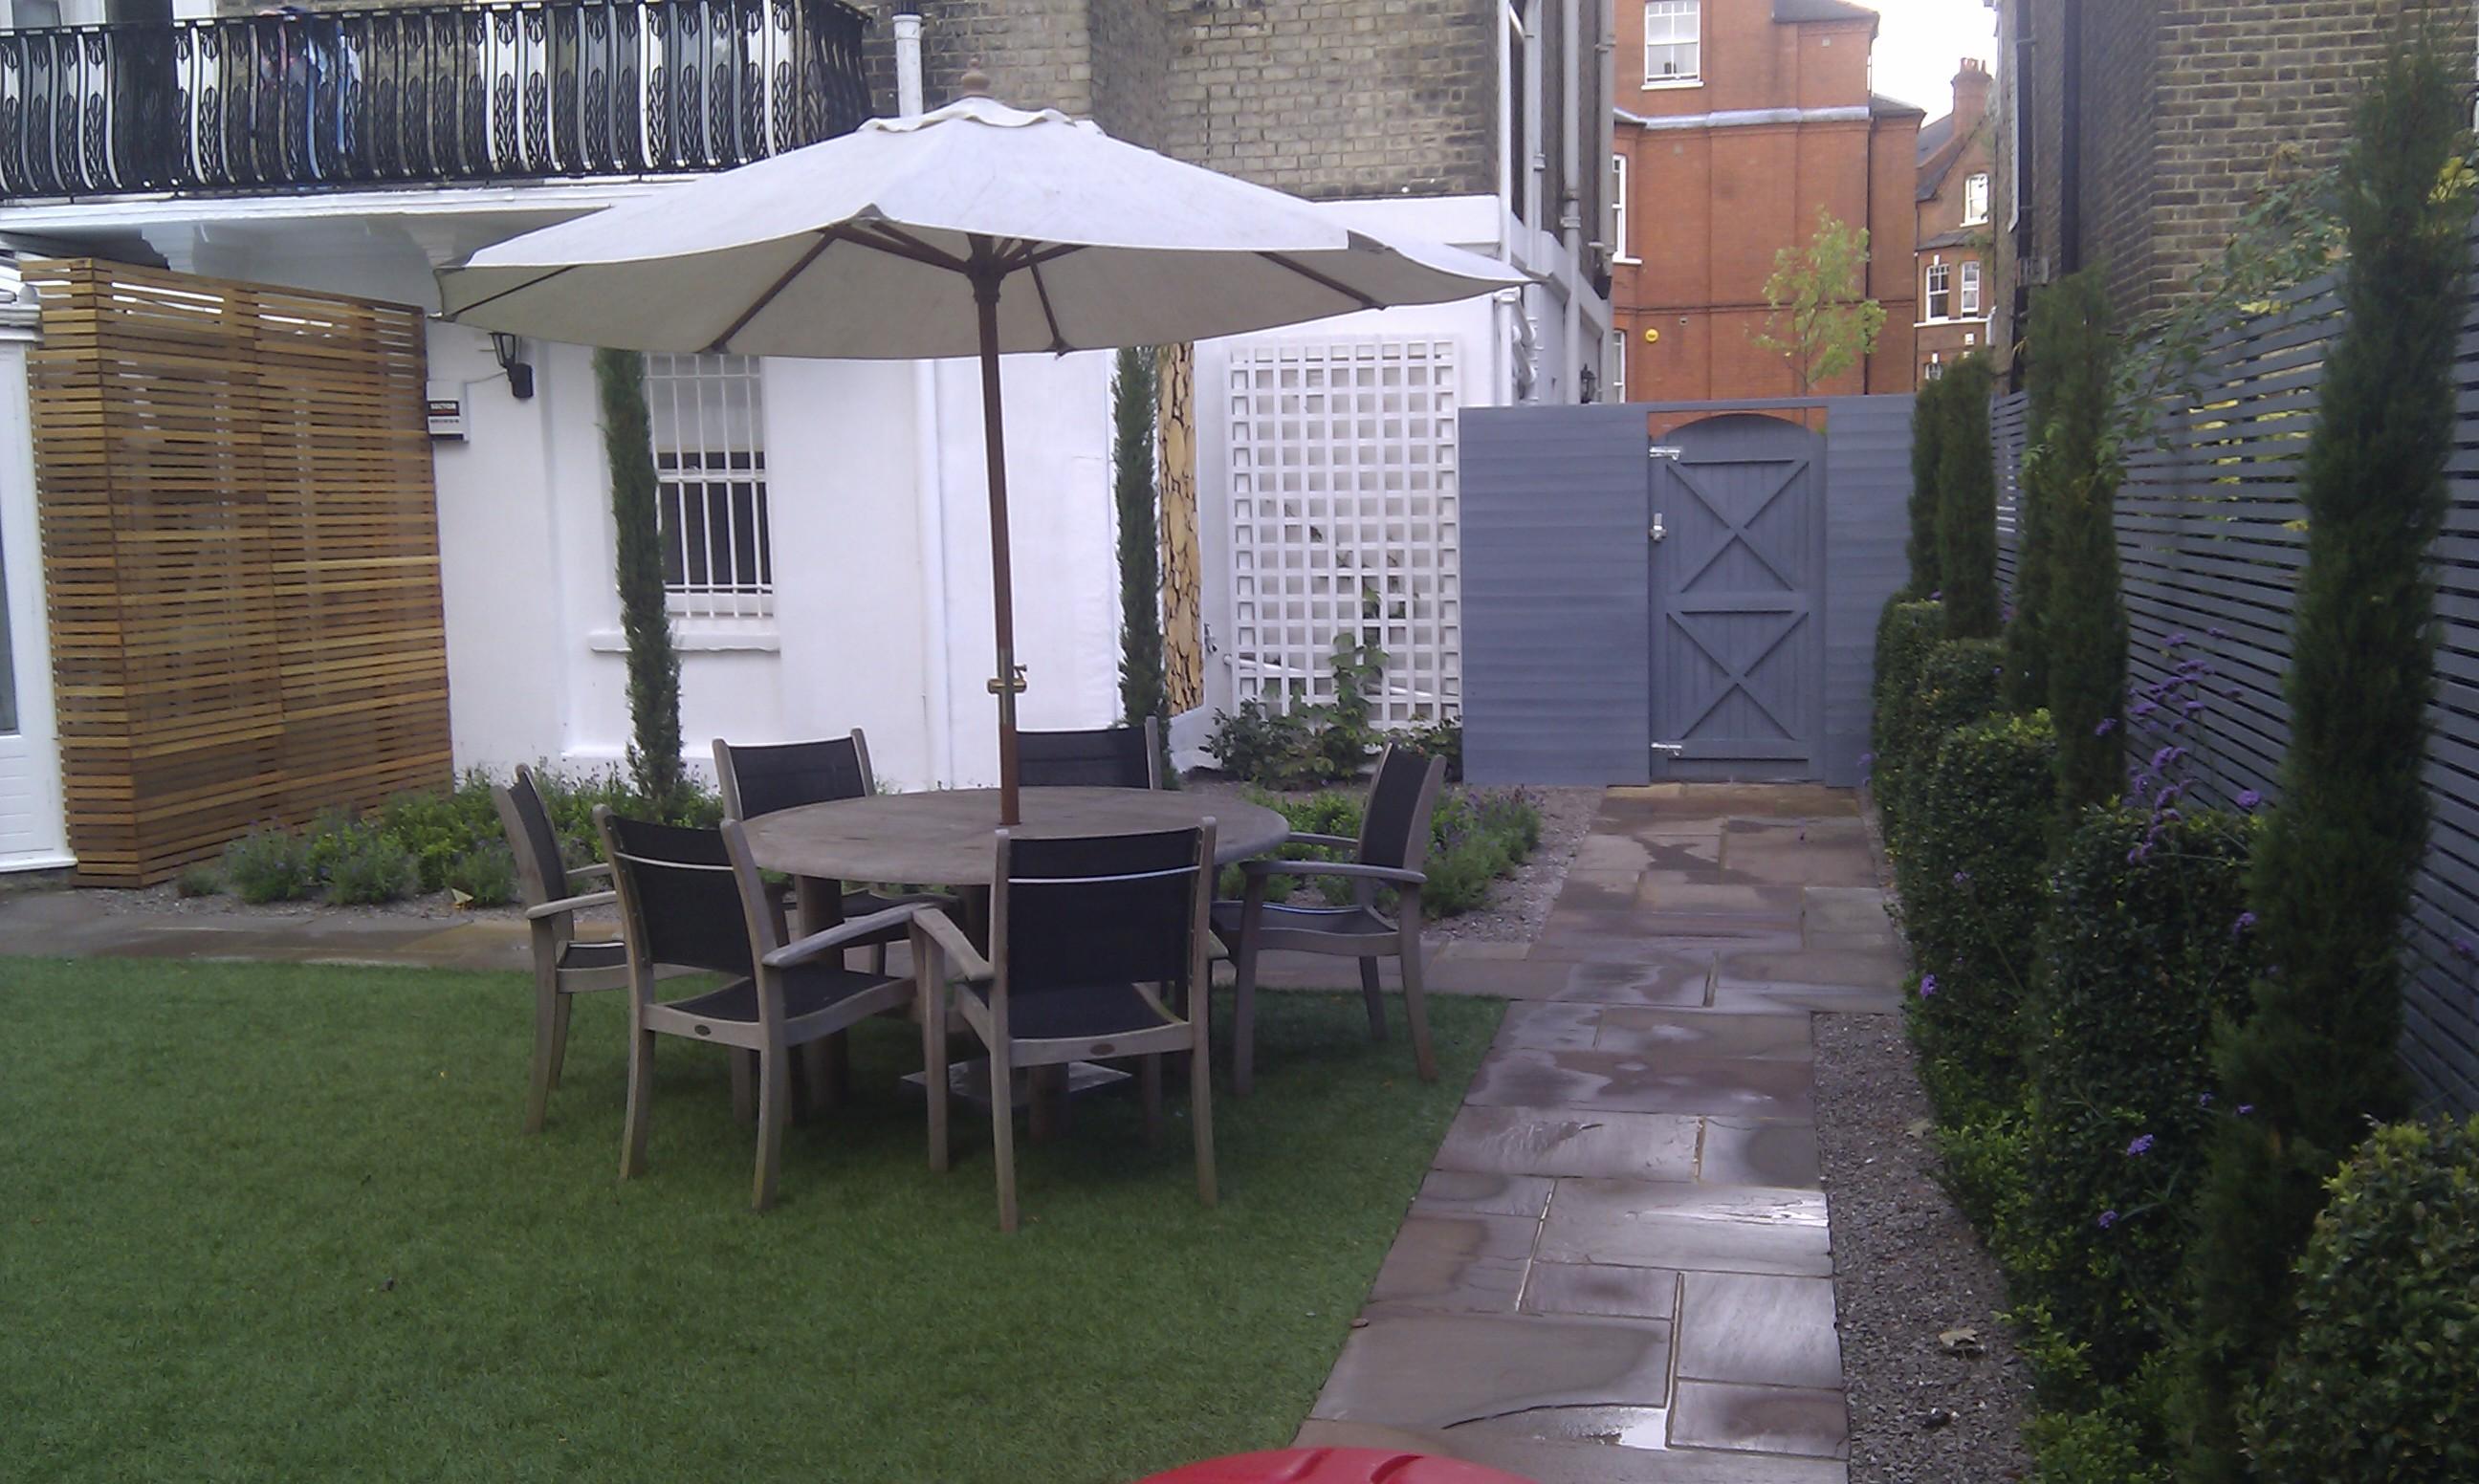 modern garden design london slatted grey privacy screen sandstone paving easy grass balau hardwood decking (31)